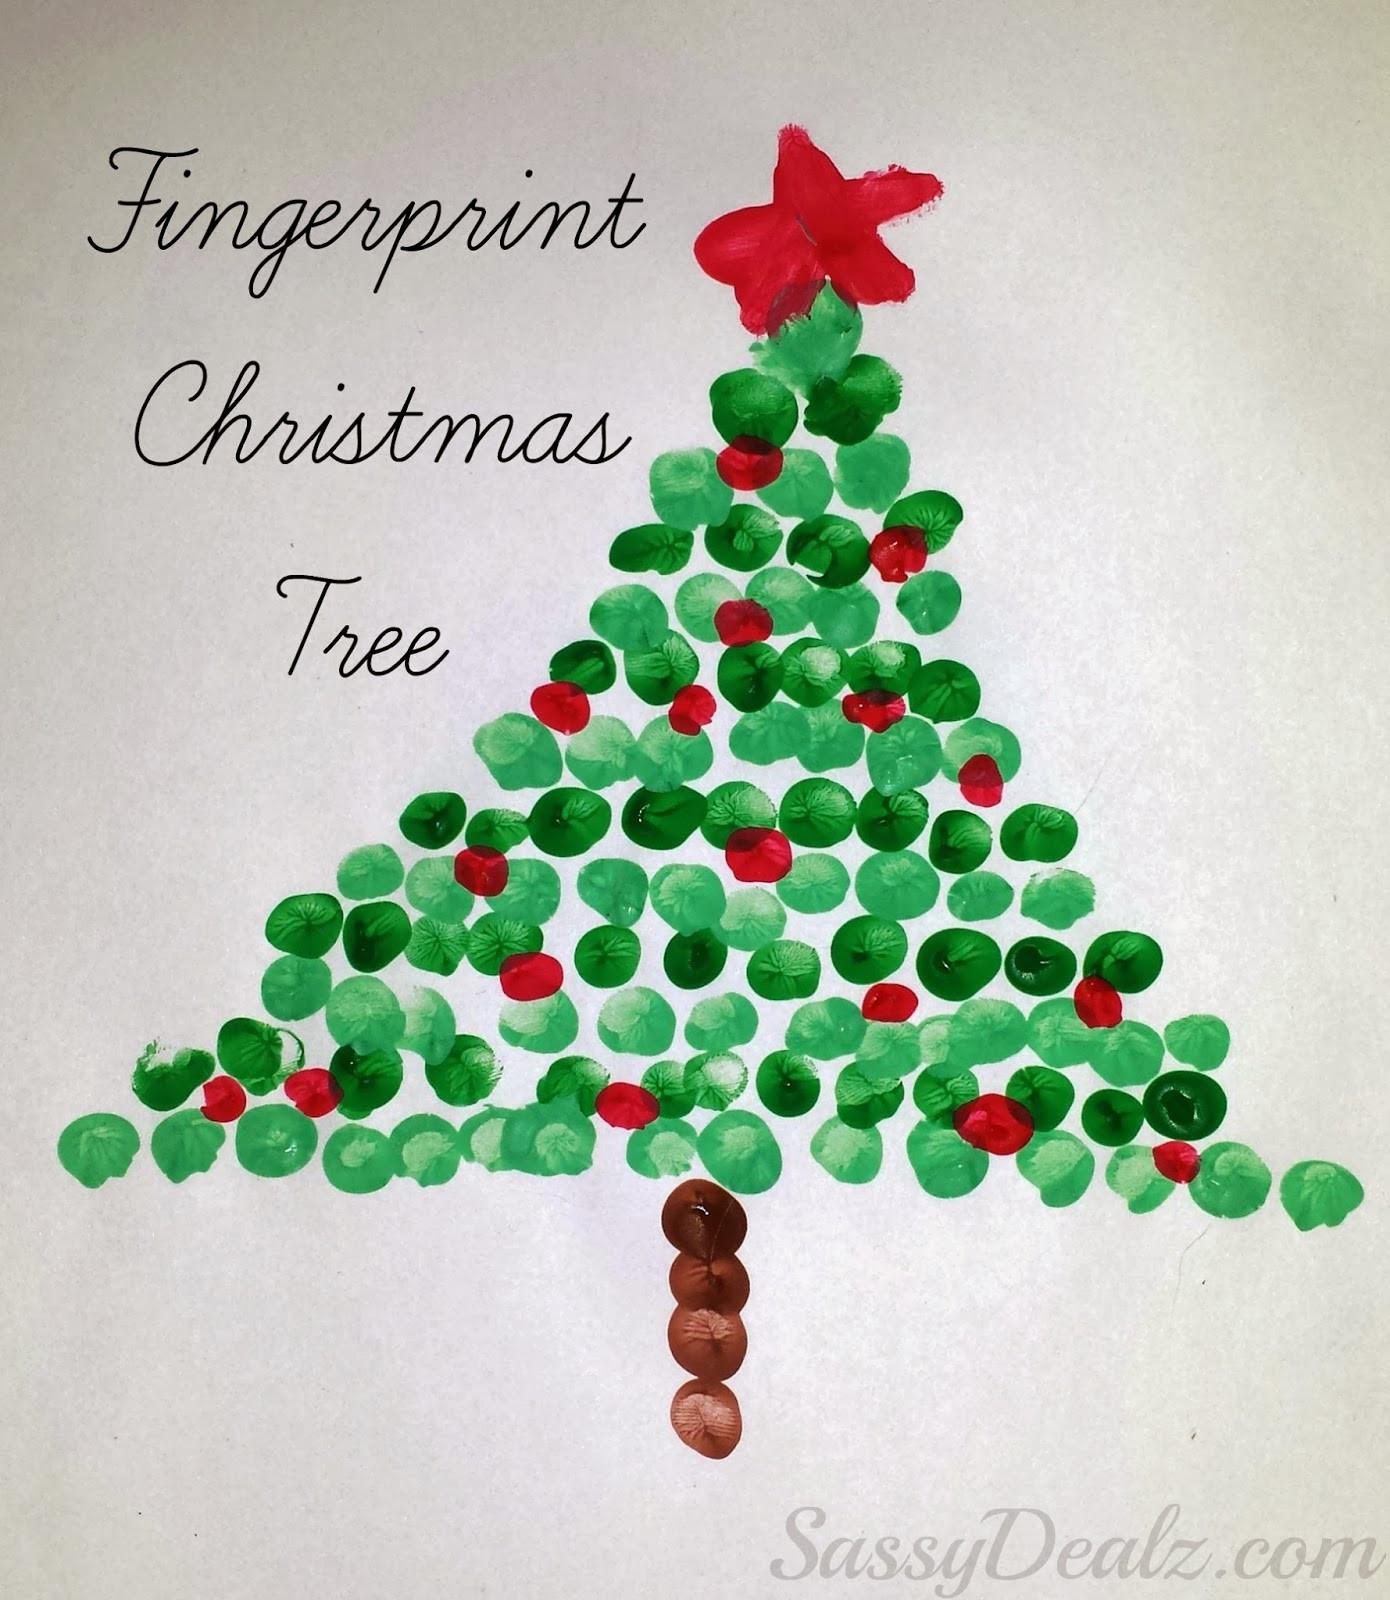 Christmas Painting Ideas For Kids  Christmas Fingerprint Crafts U Create